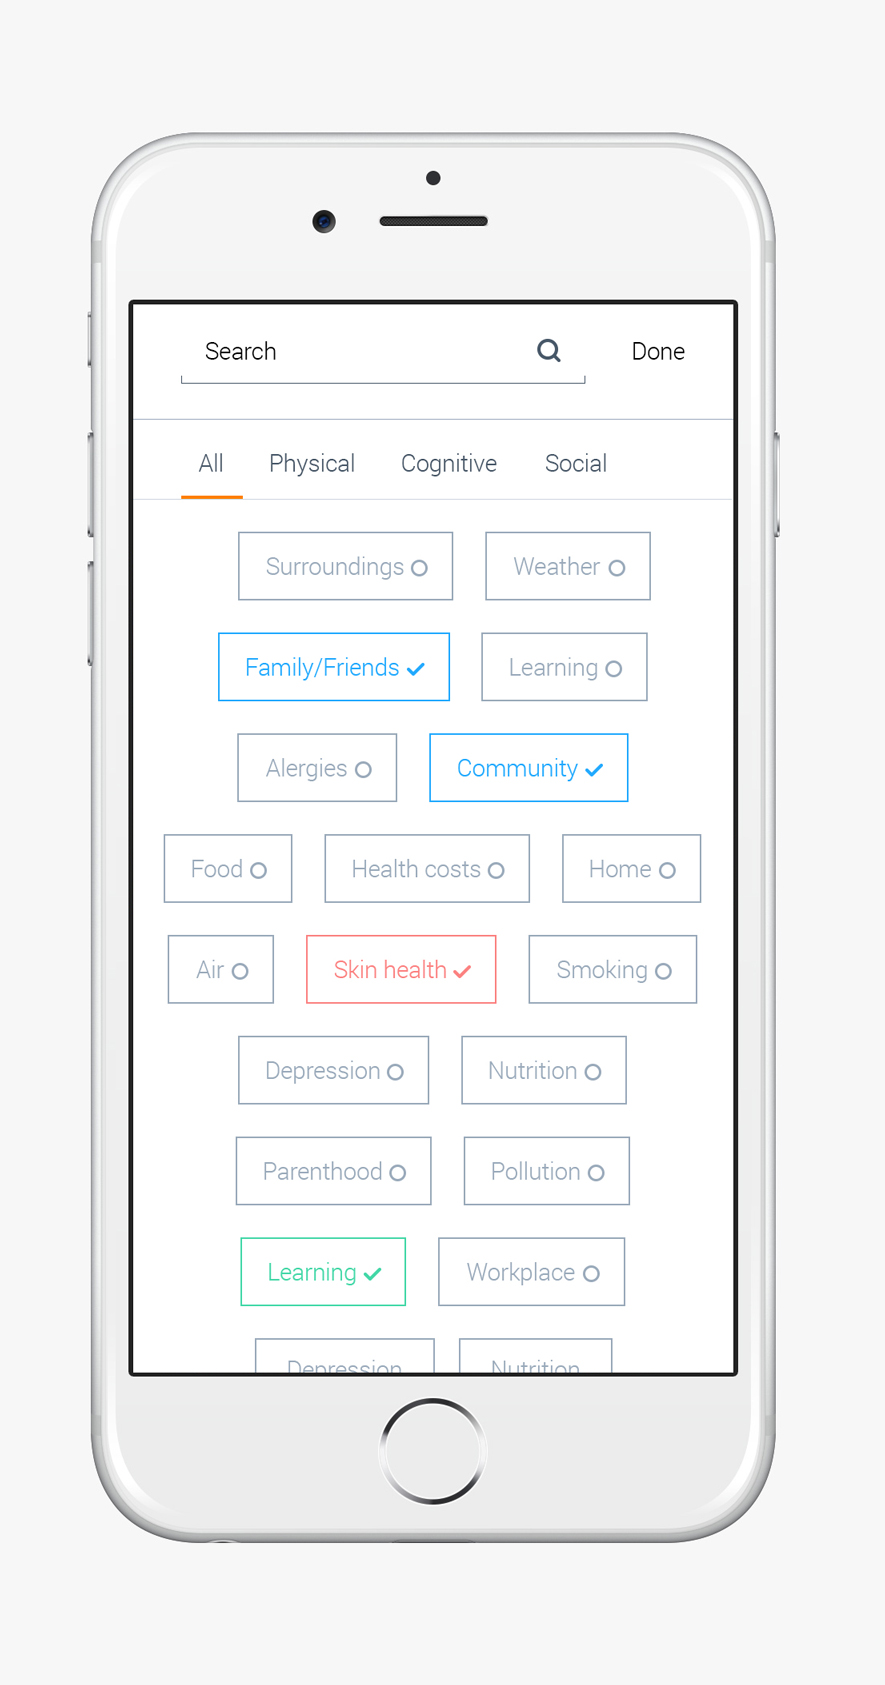 Tonic-interaction-app-design-furthermore.jpg